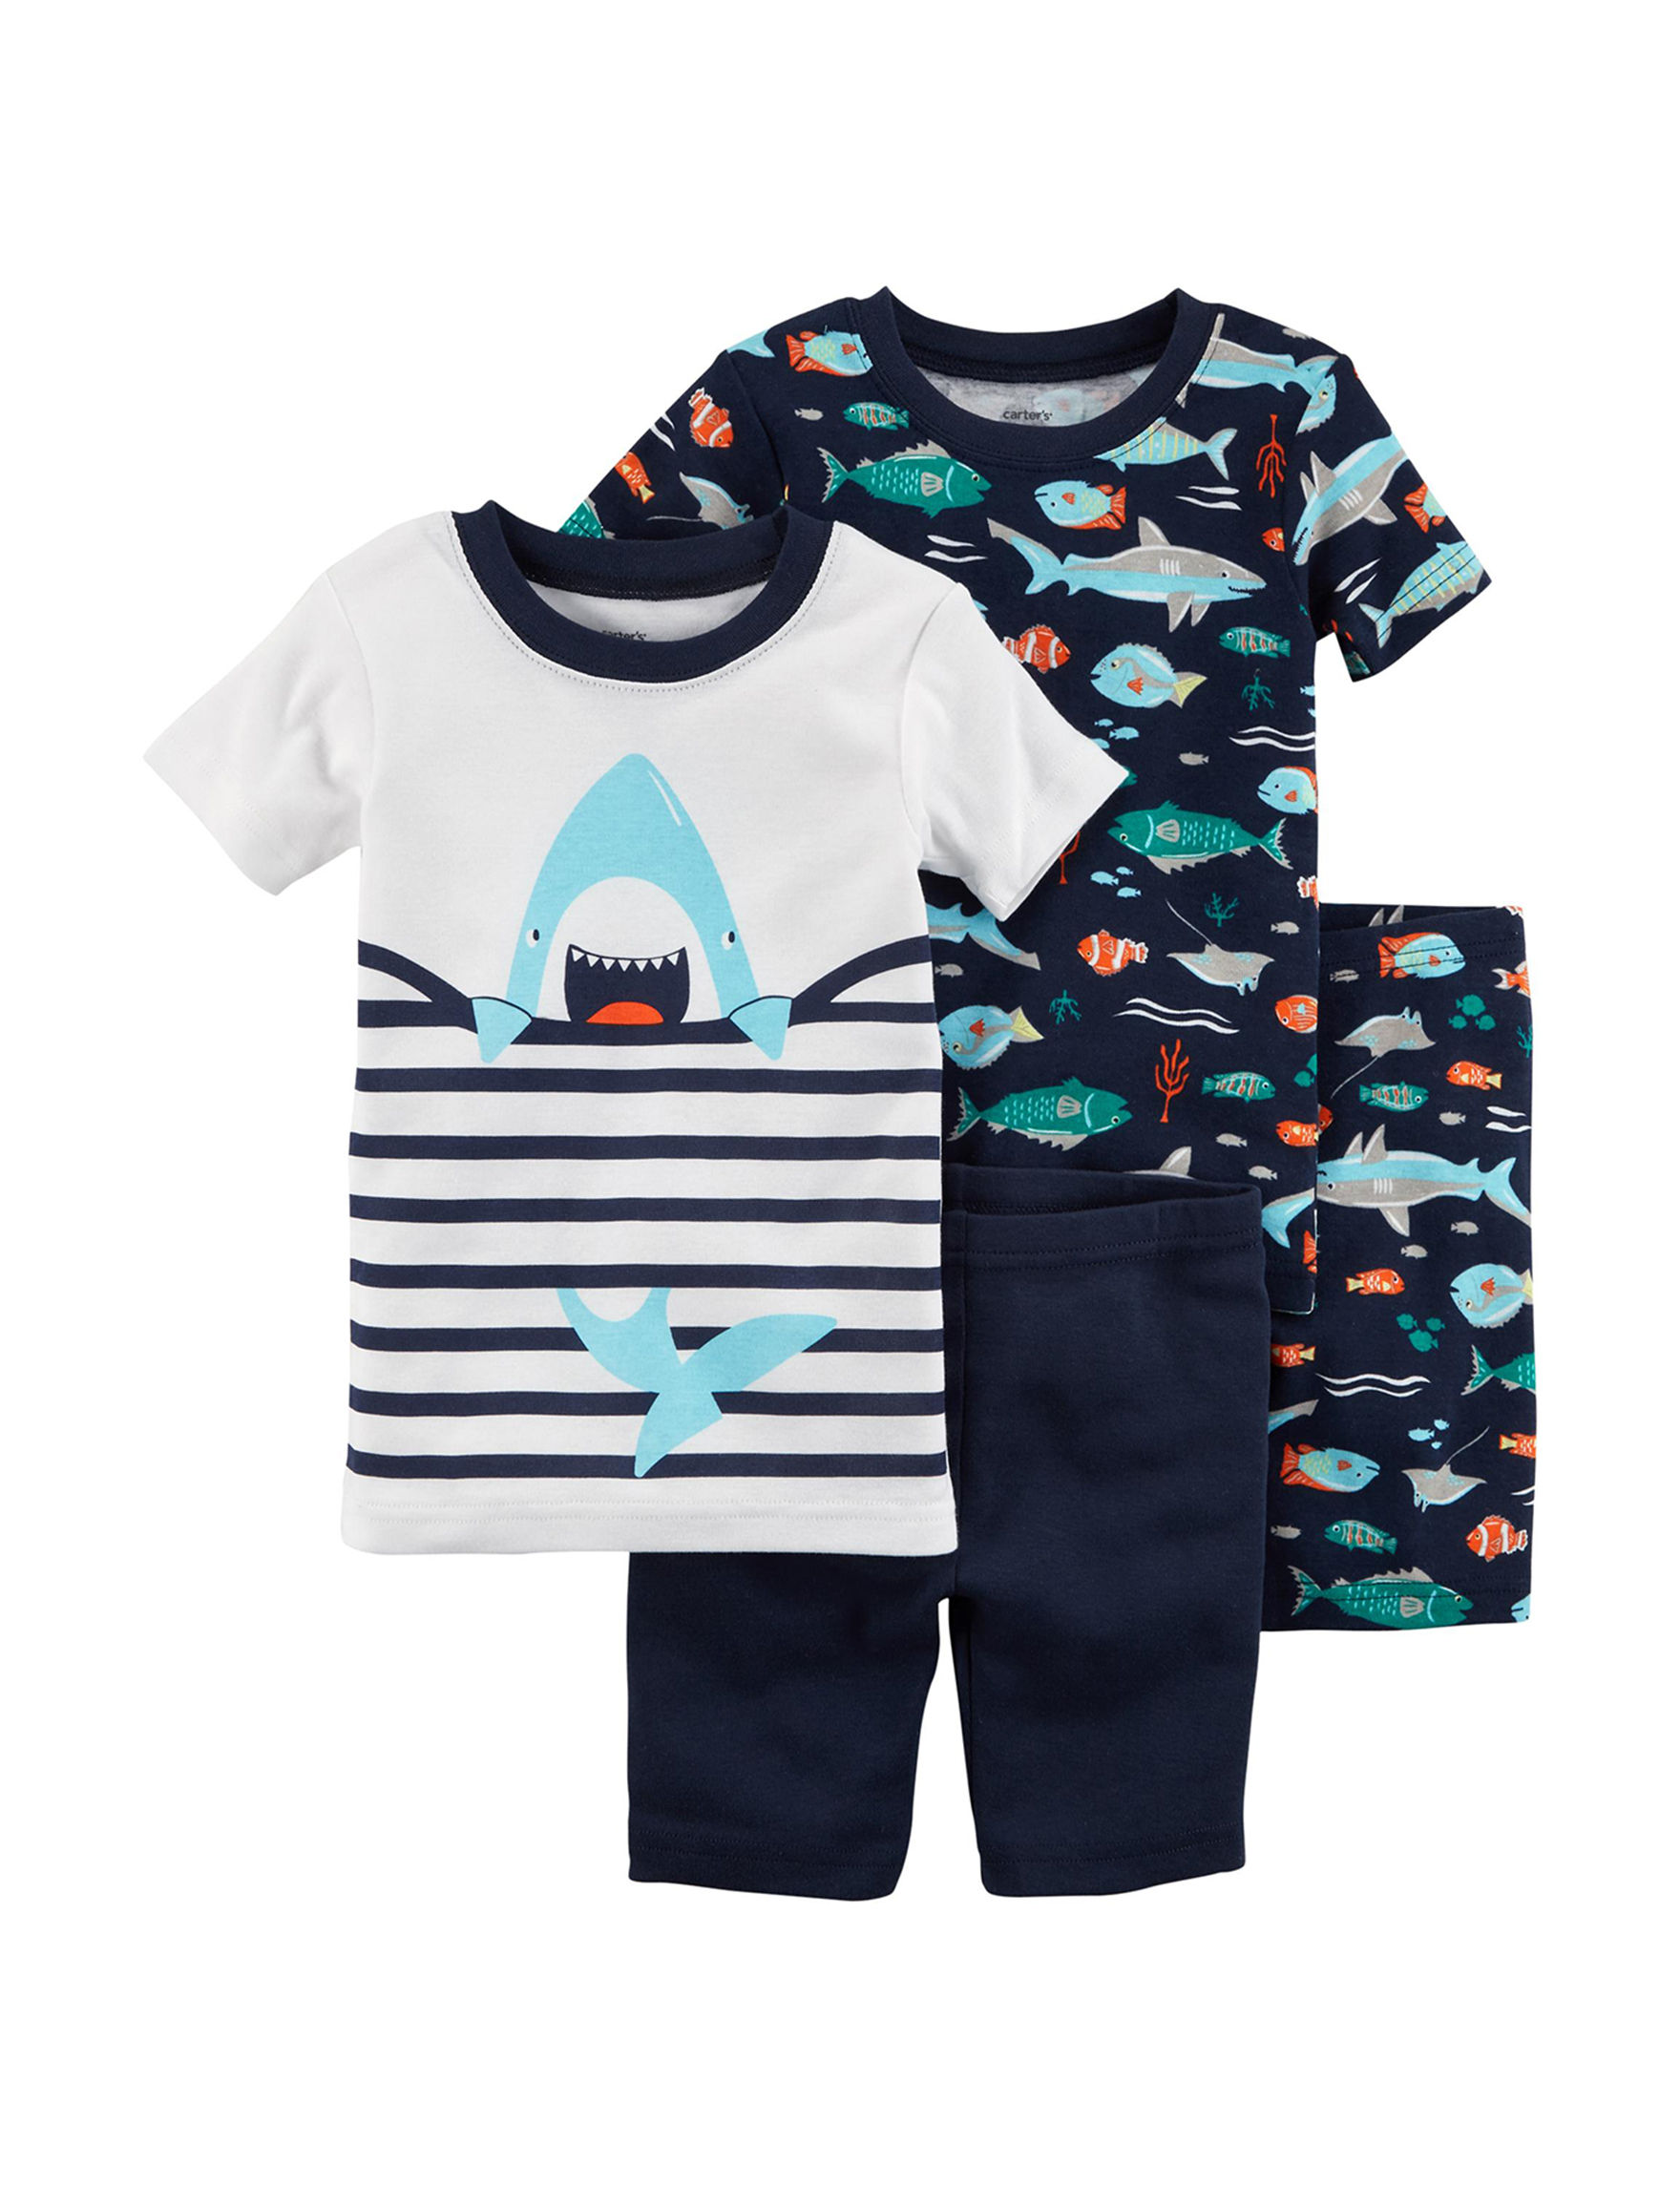 Carter's White / Blue / Green Pajama Sets